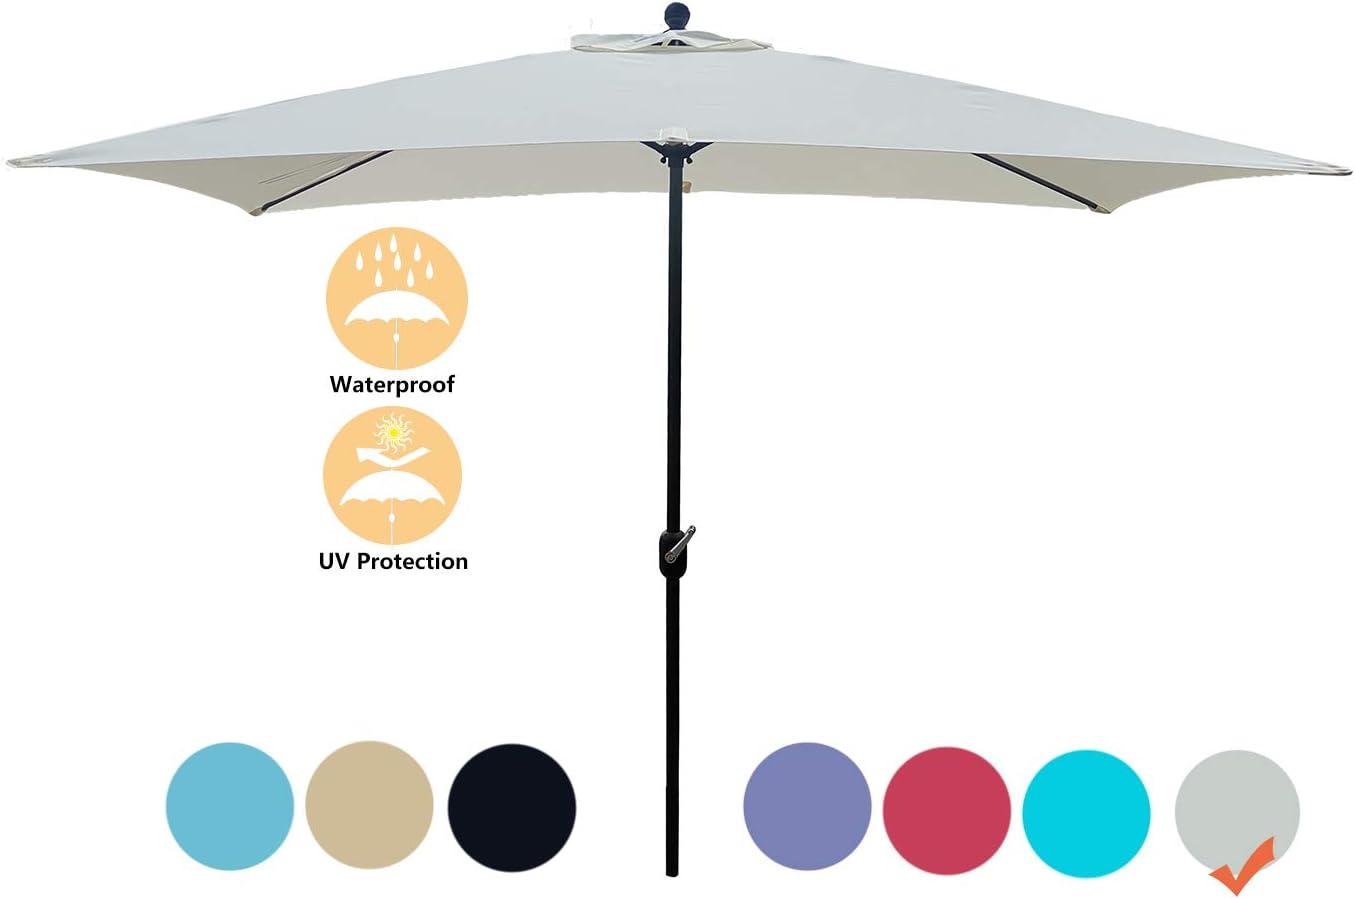 Jadada Rectangular Patio Umbrella Outdoor Market Table Umbrella with Crank Handle, 6.5 by 10 Ft White